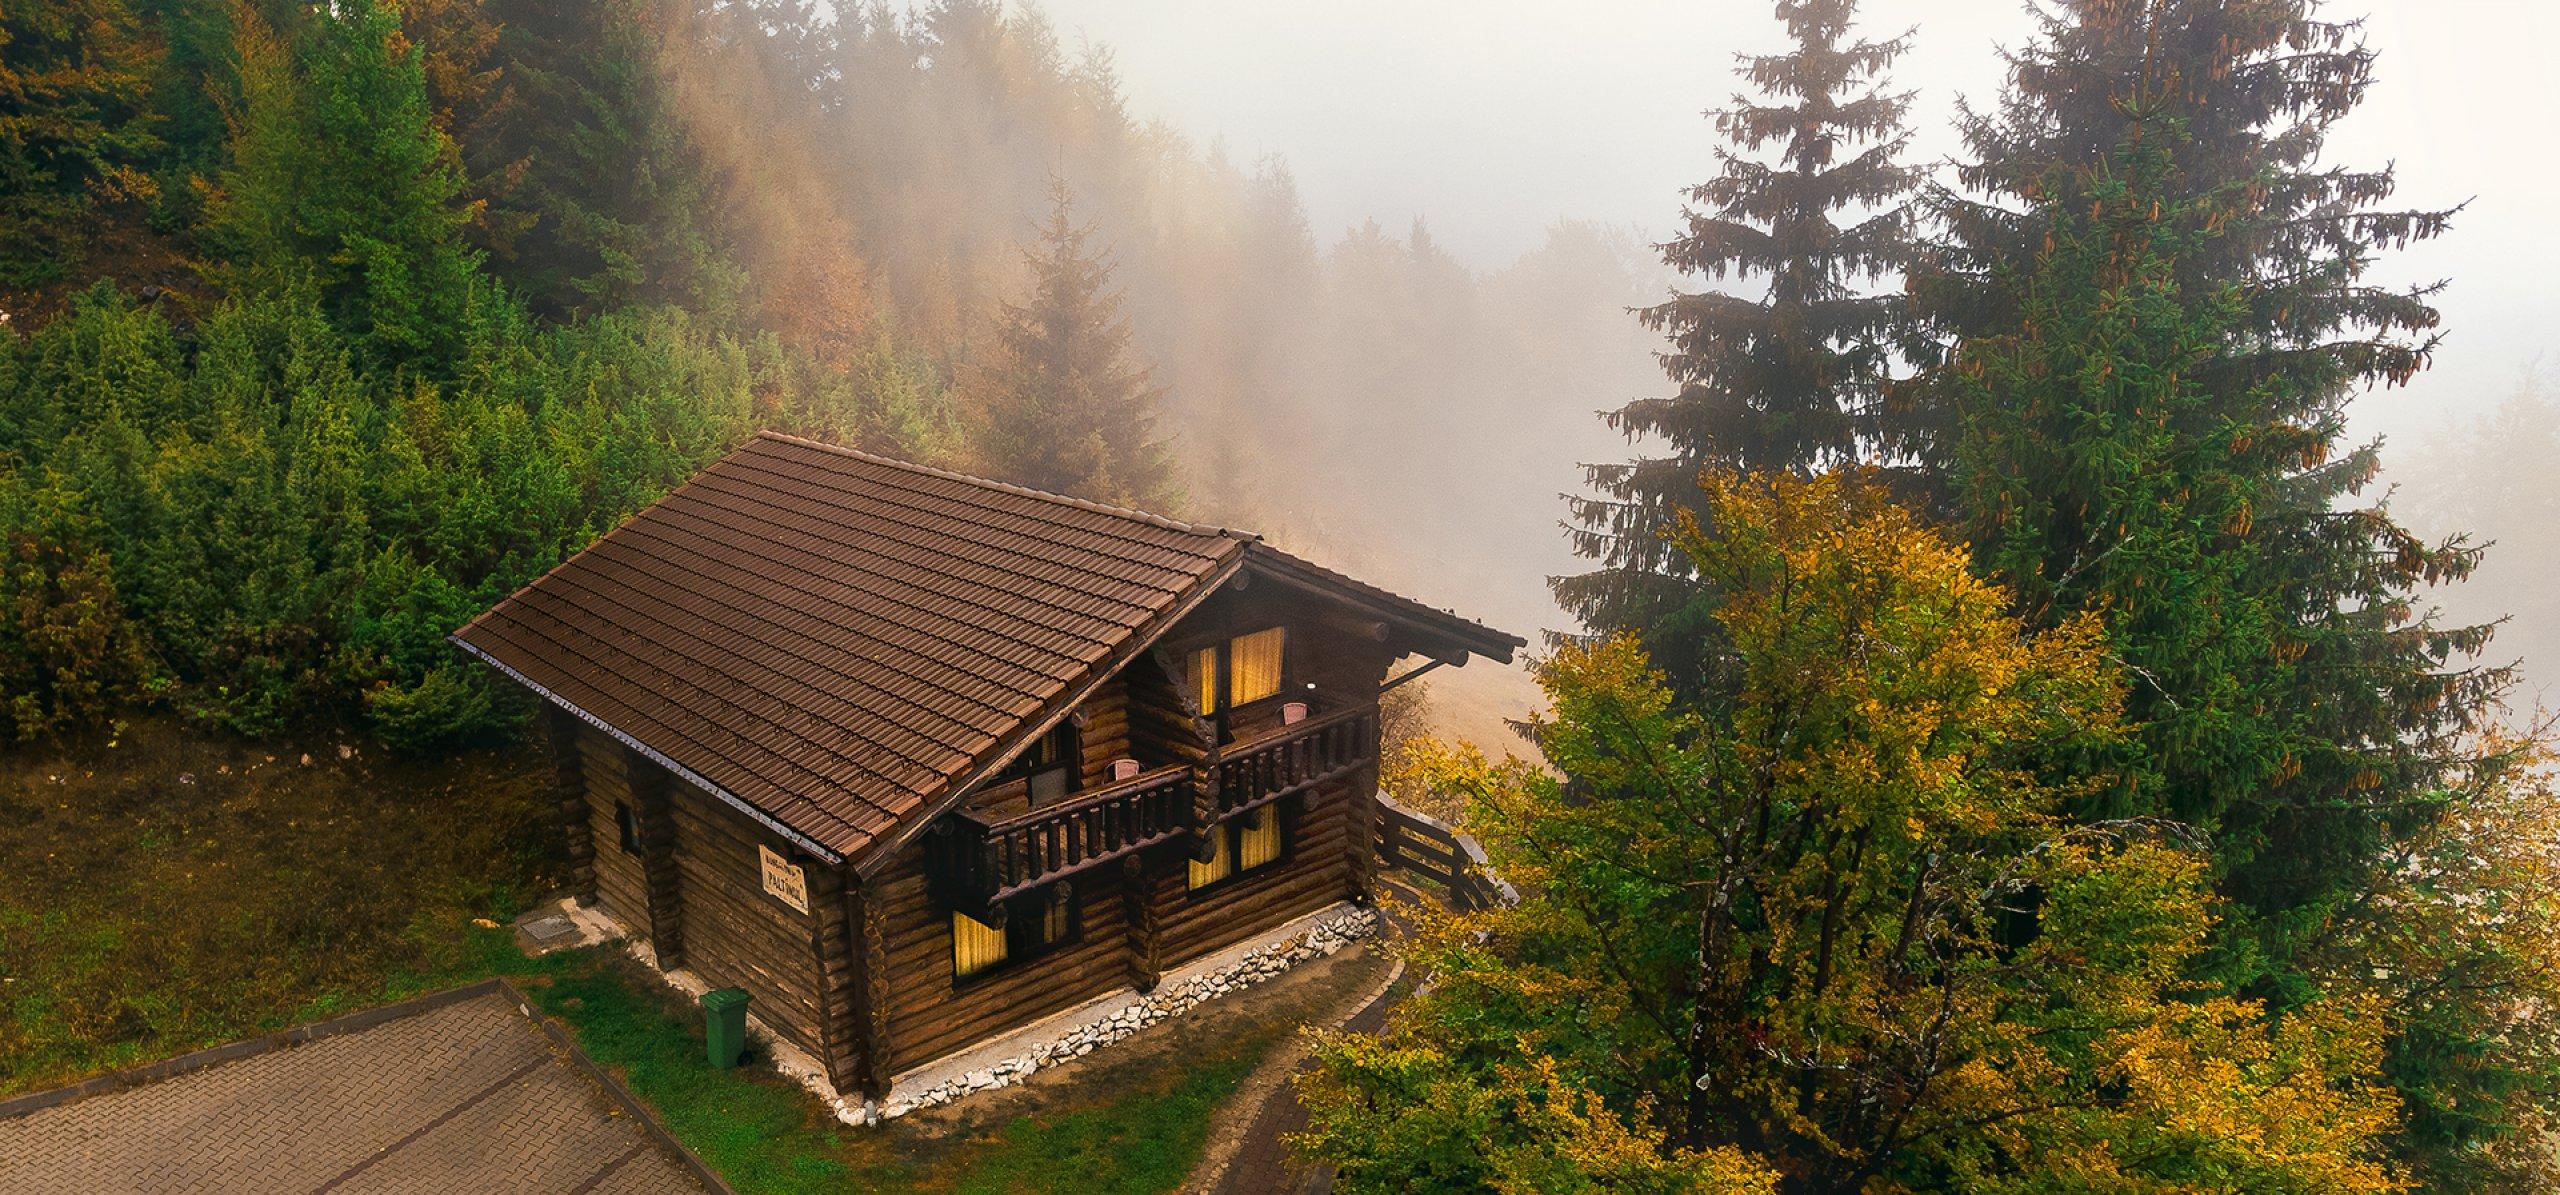 vila-paltinul-vedere-montana-cheile-gradistei-fundata